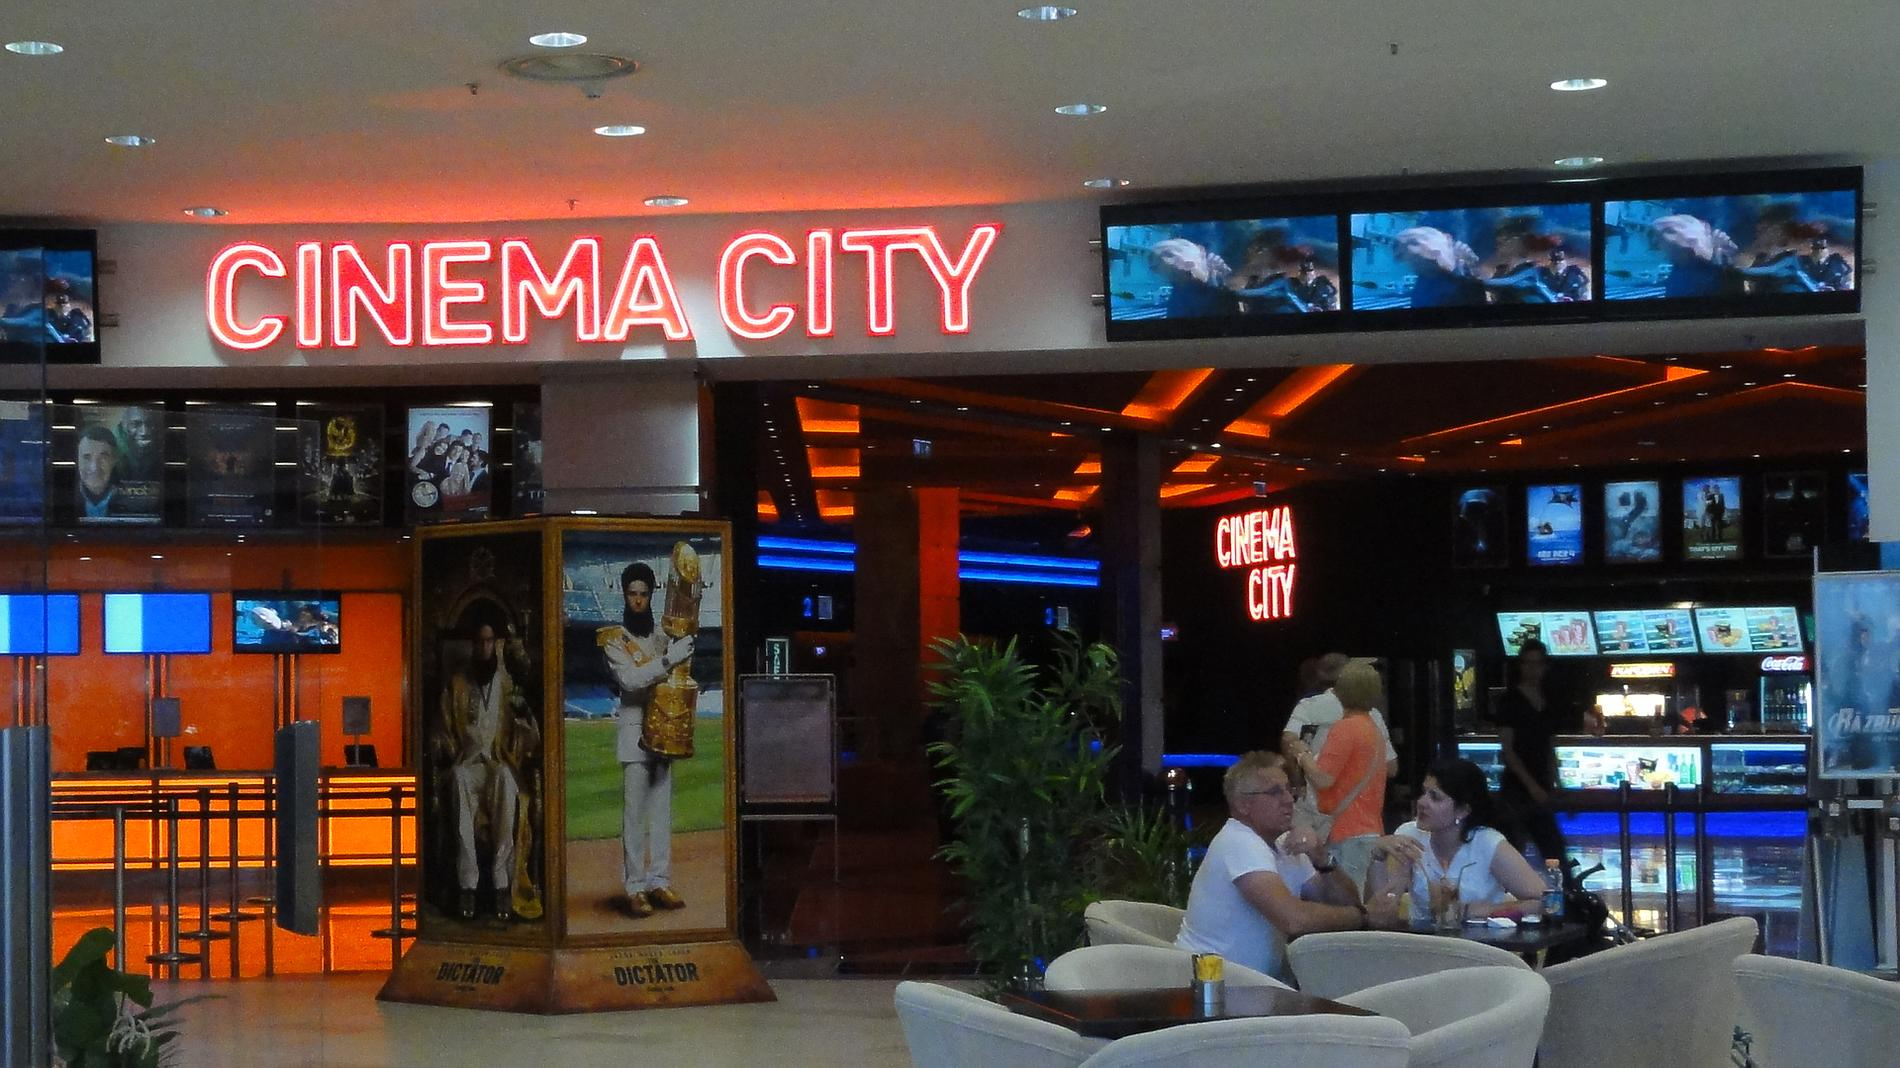 Cinema City - neon letters